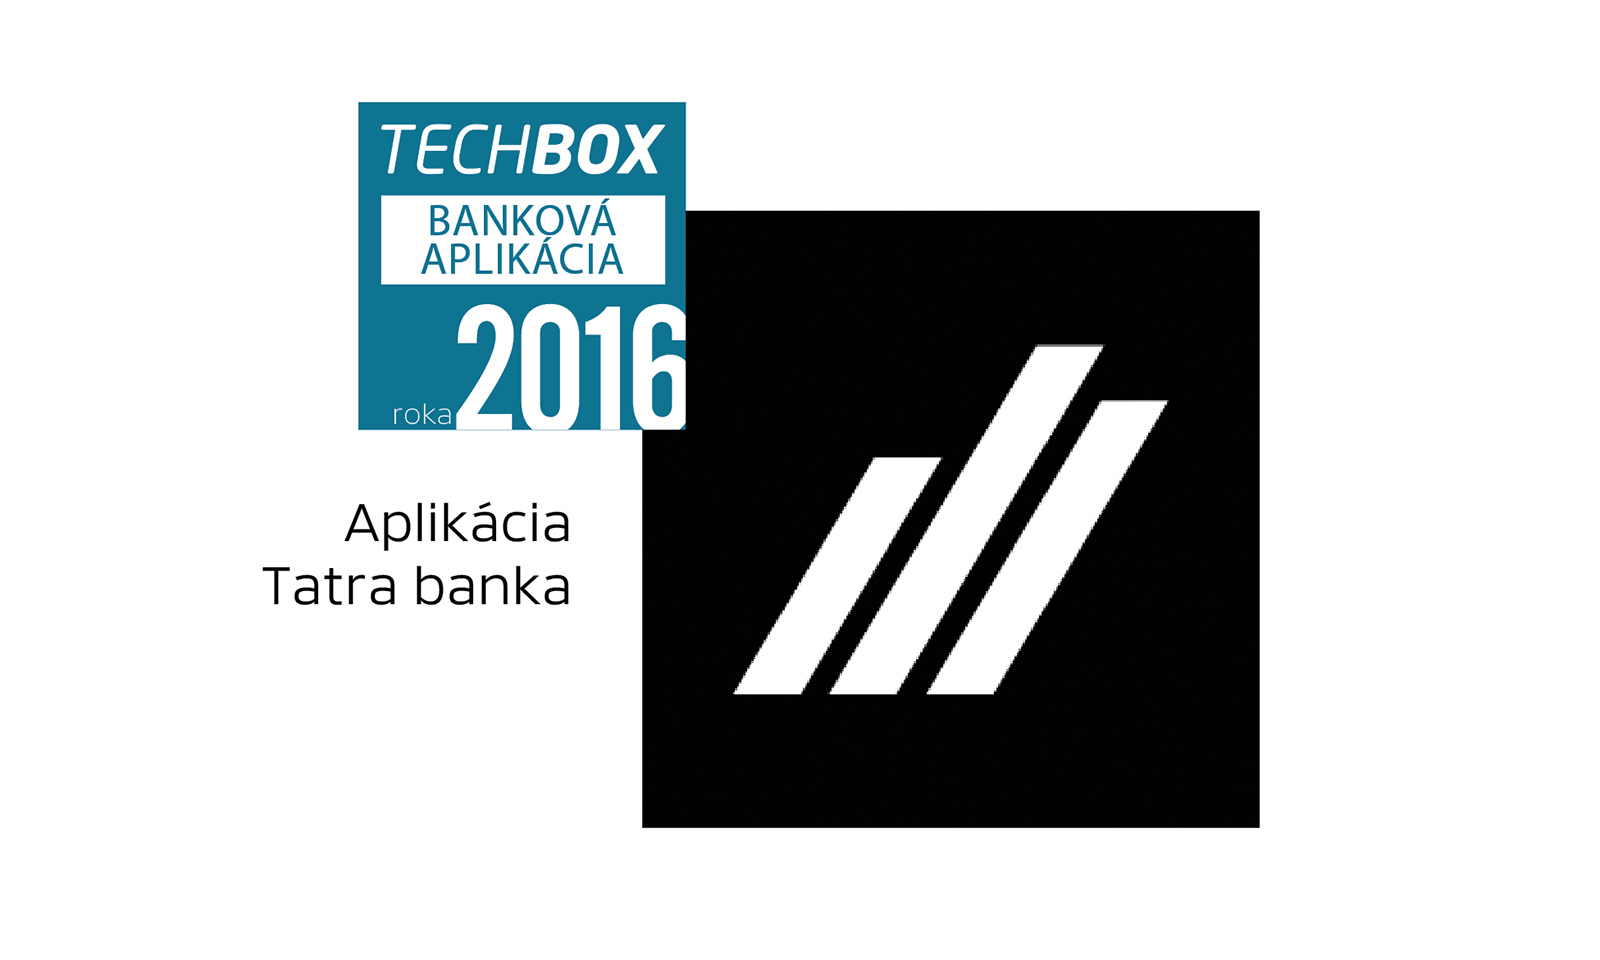 TECHBOX BANKOVA APLIKACIA roka 2016